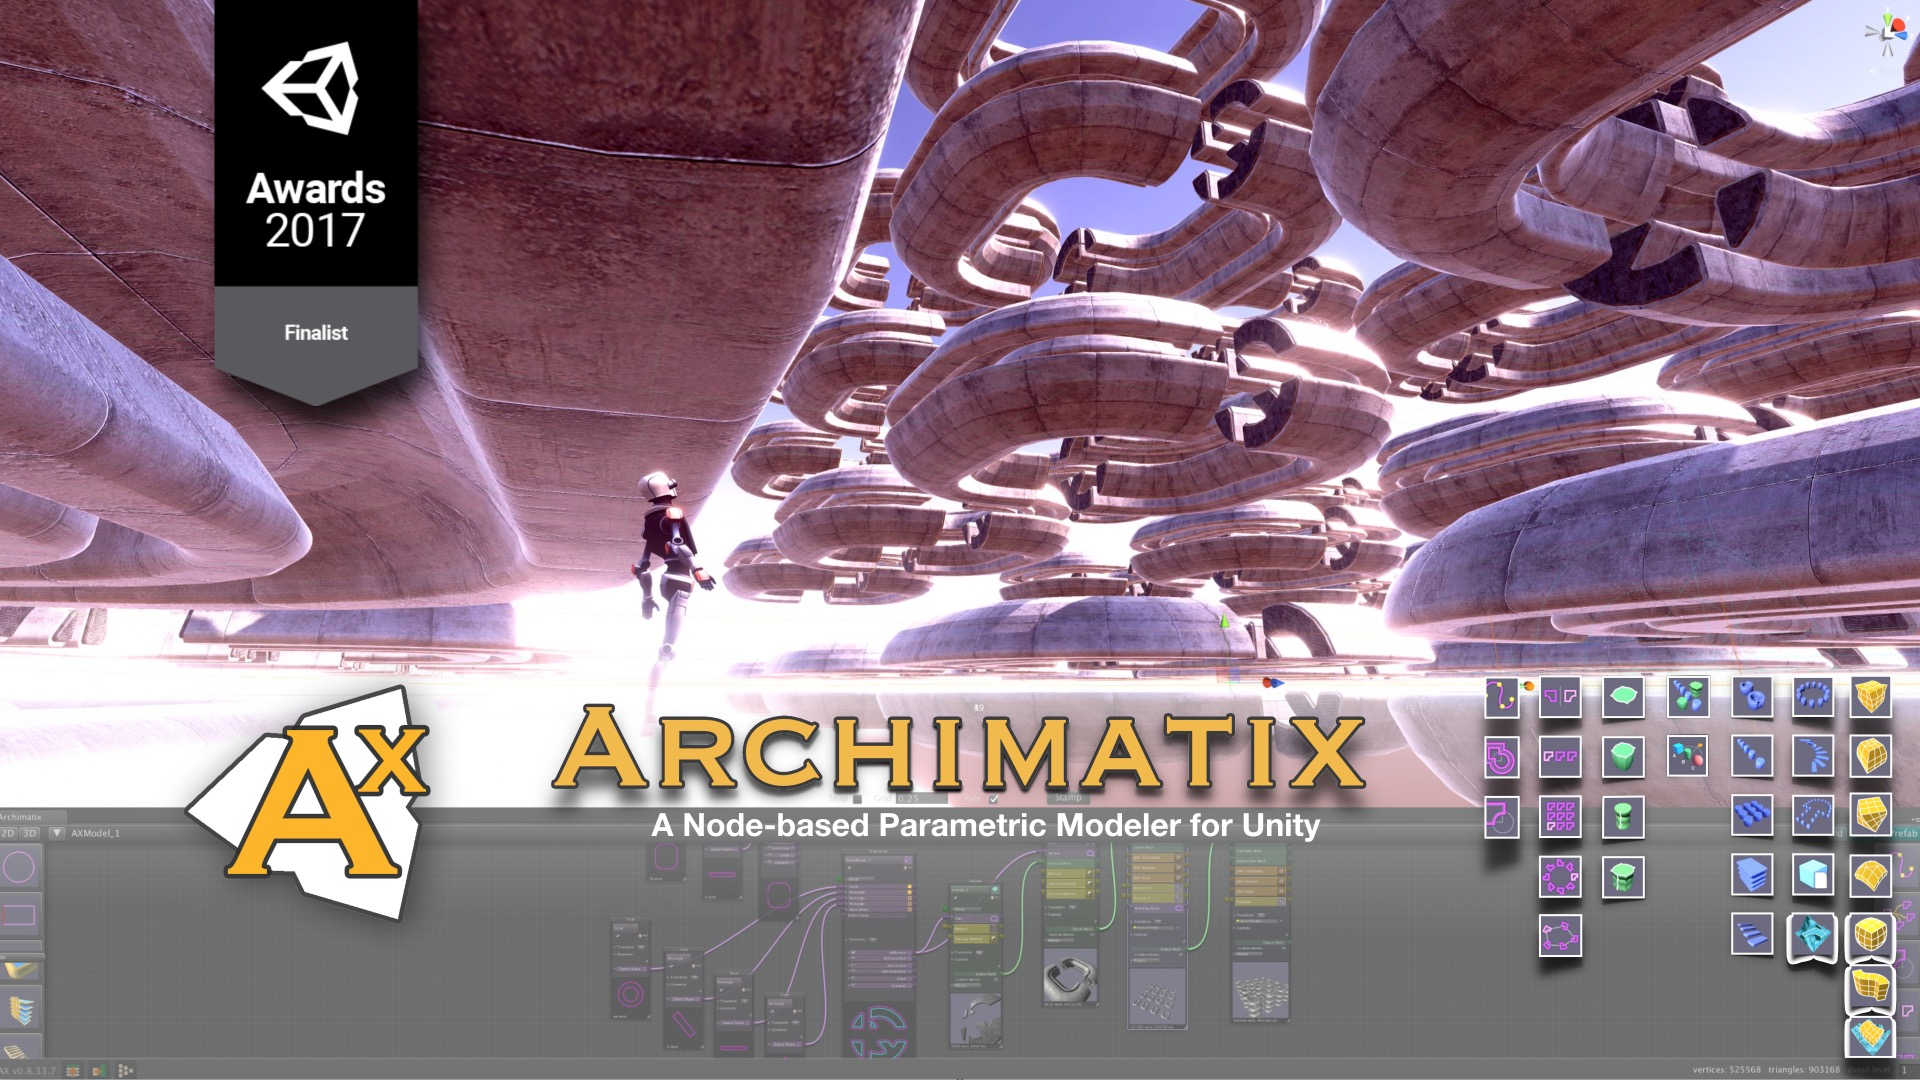 Archimatix